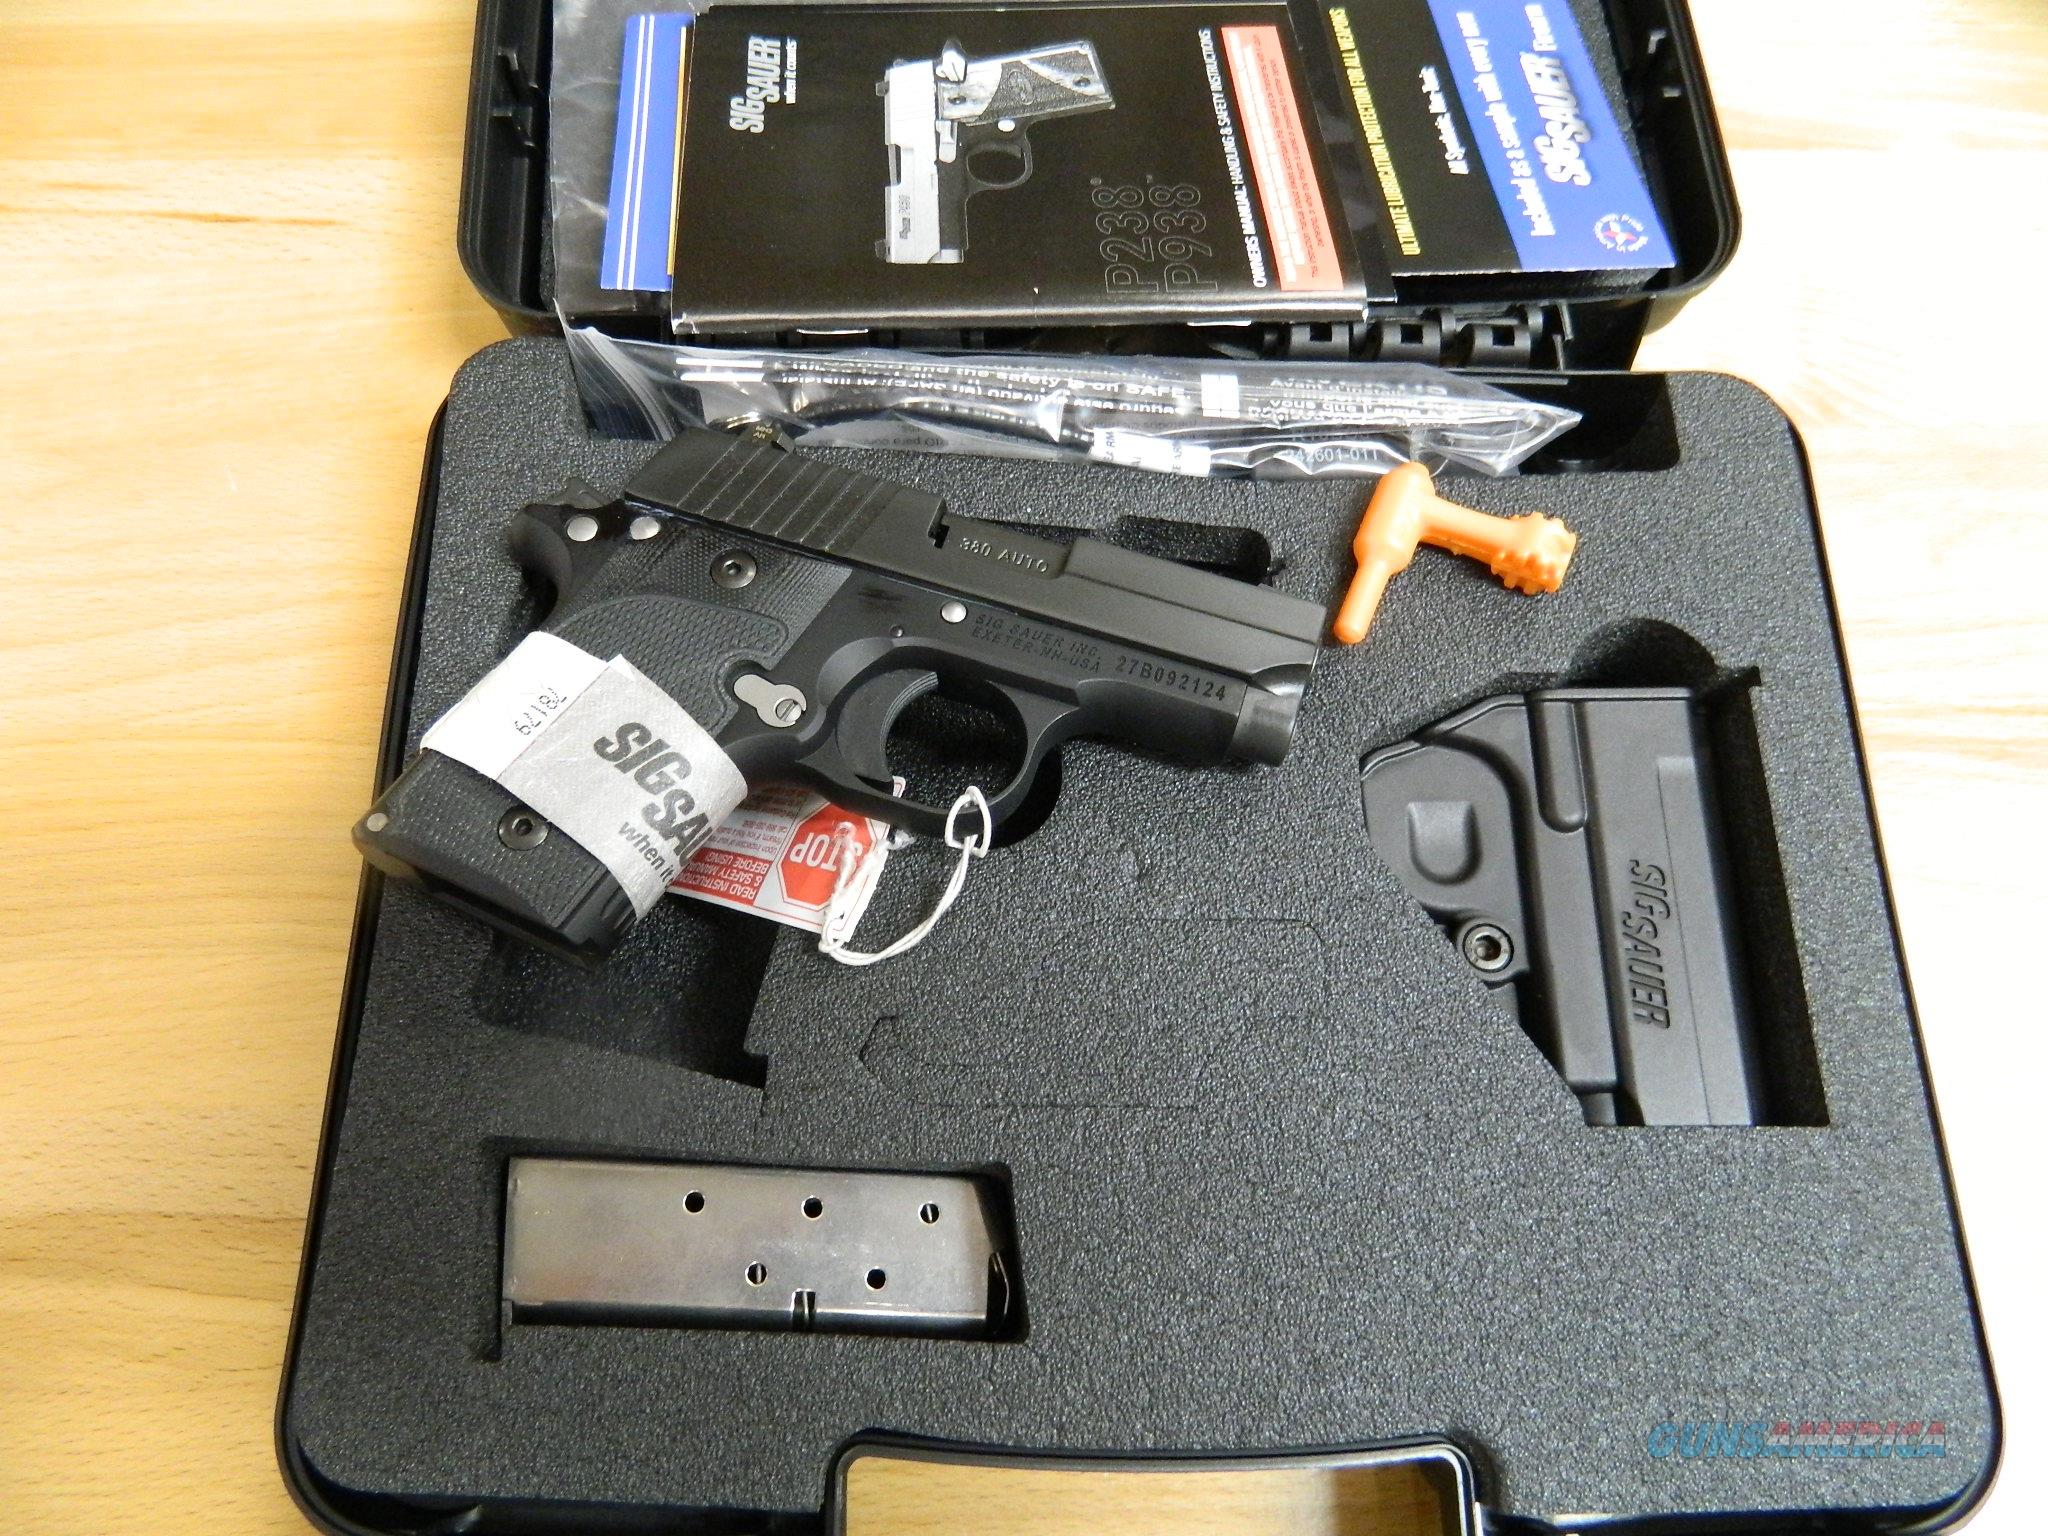 Sig Sauer P238 Nightmare night sights 380ACP NIB  Guns > Pistols > Sig - Sauer/Sigarms Pistols > P238